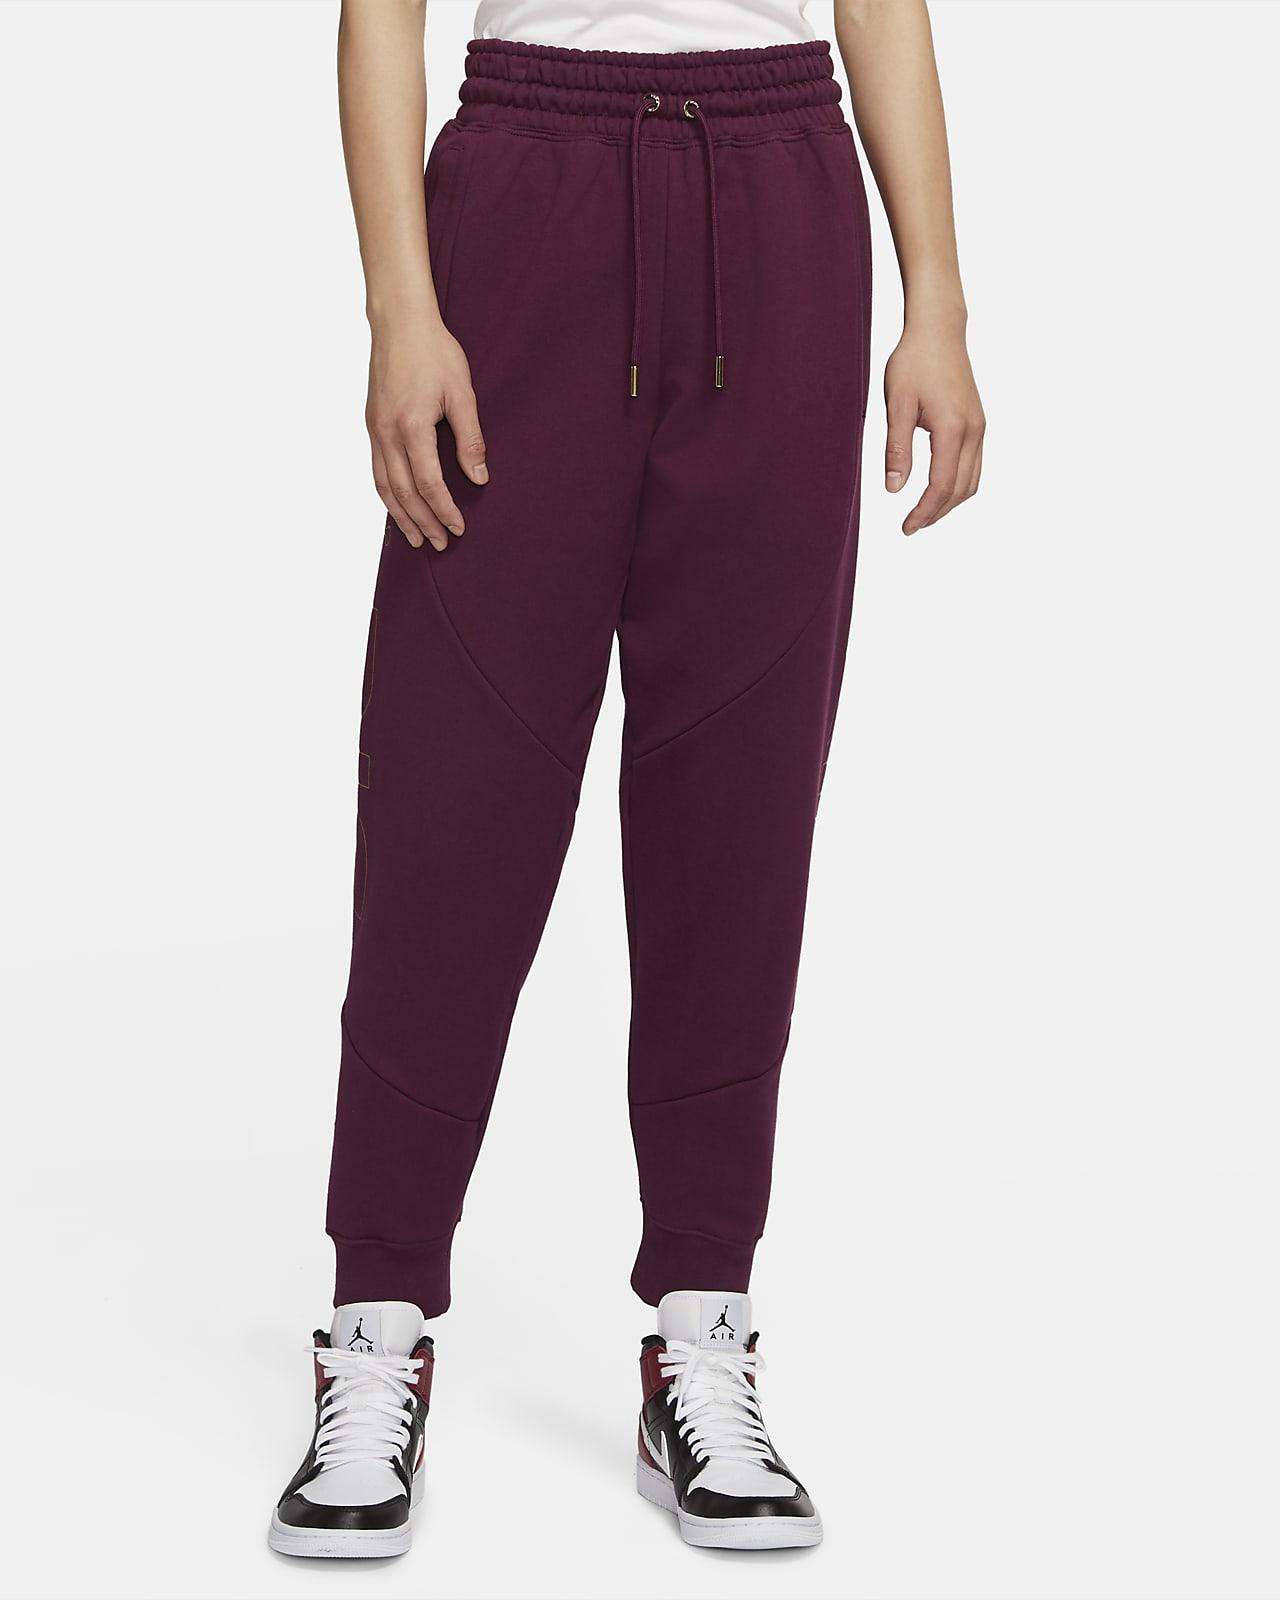 Paris Saint-Germain Women's Fleece Pants